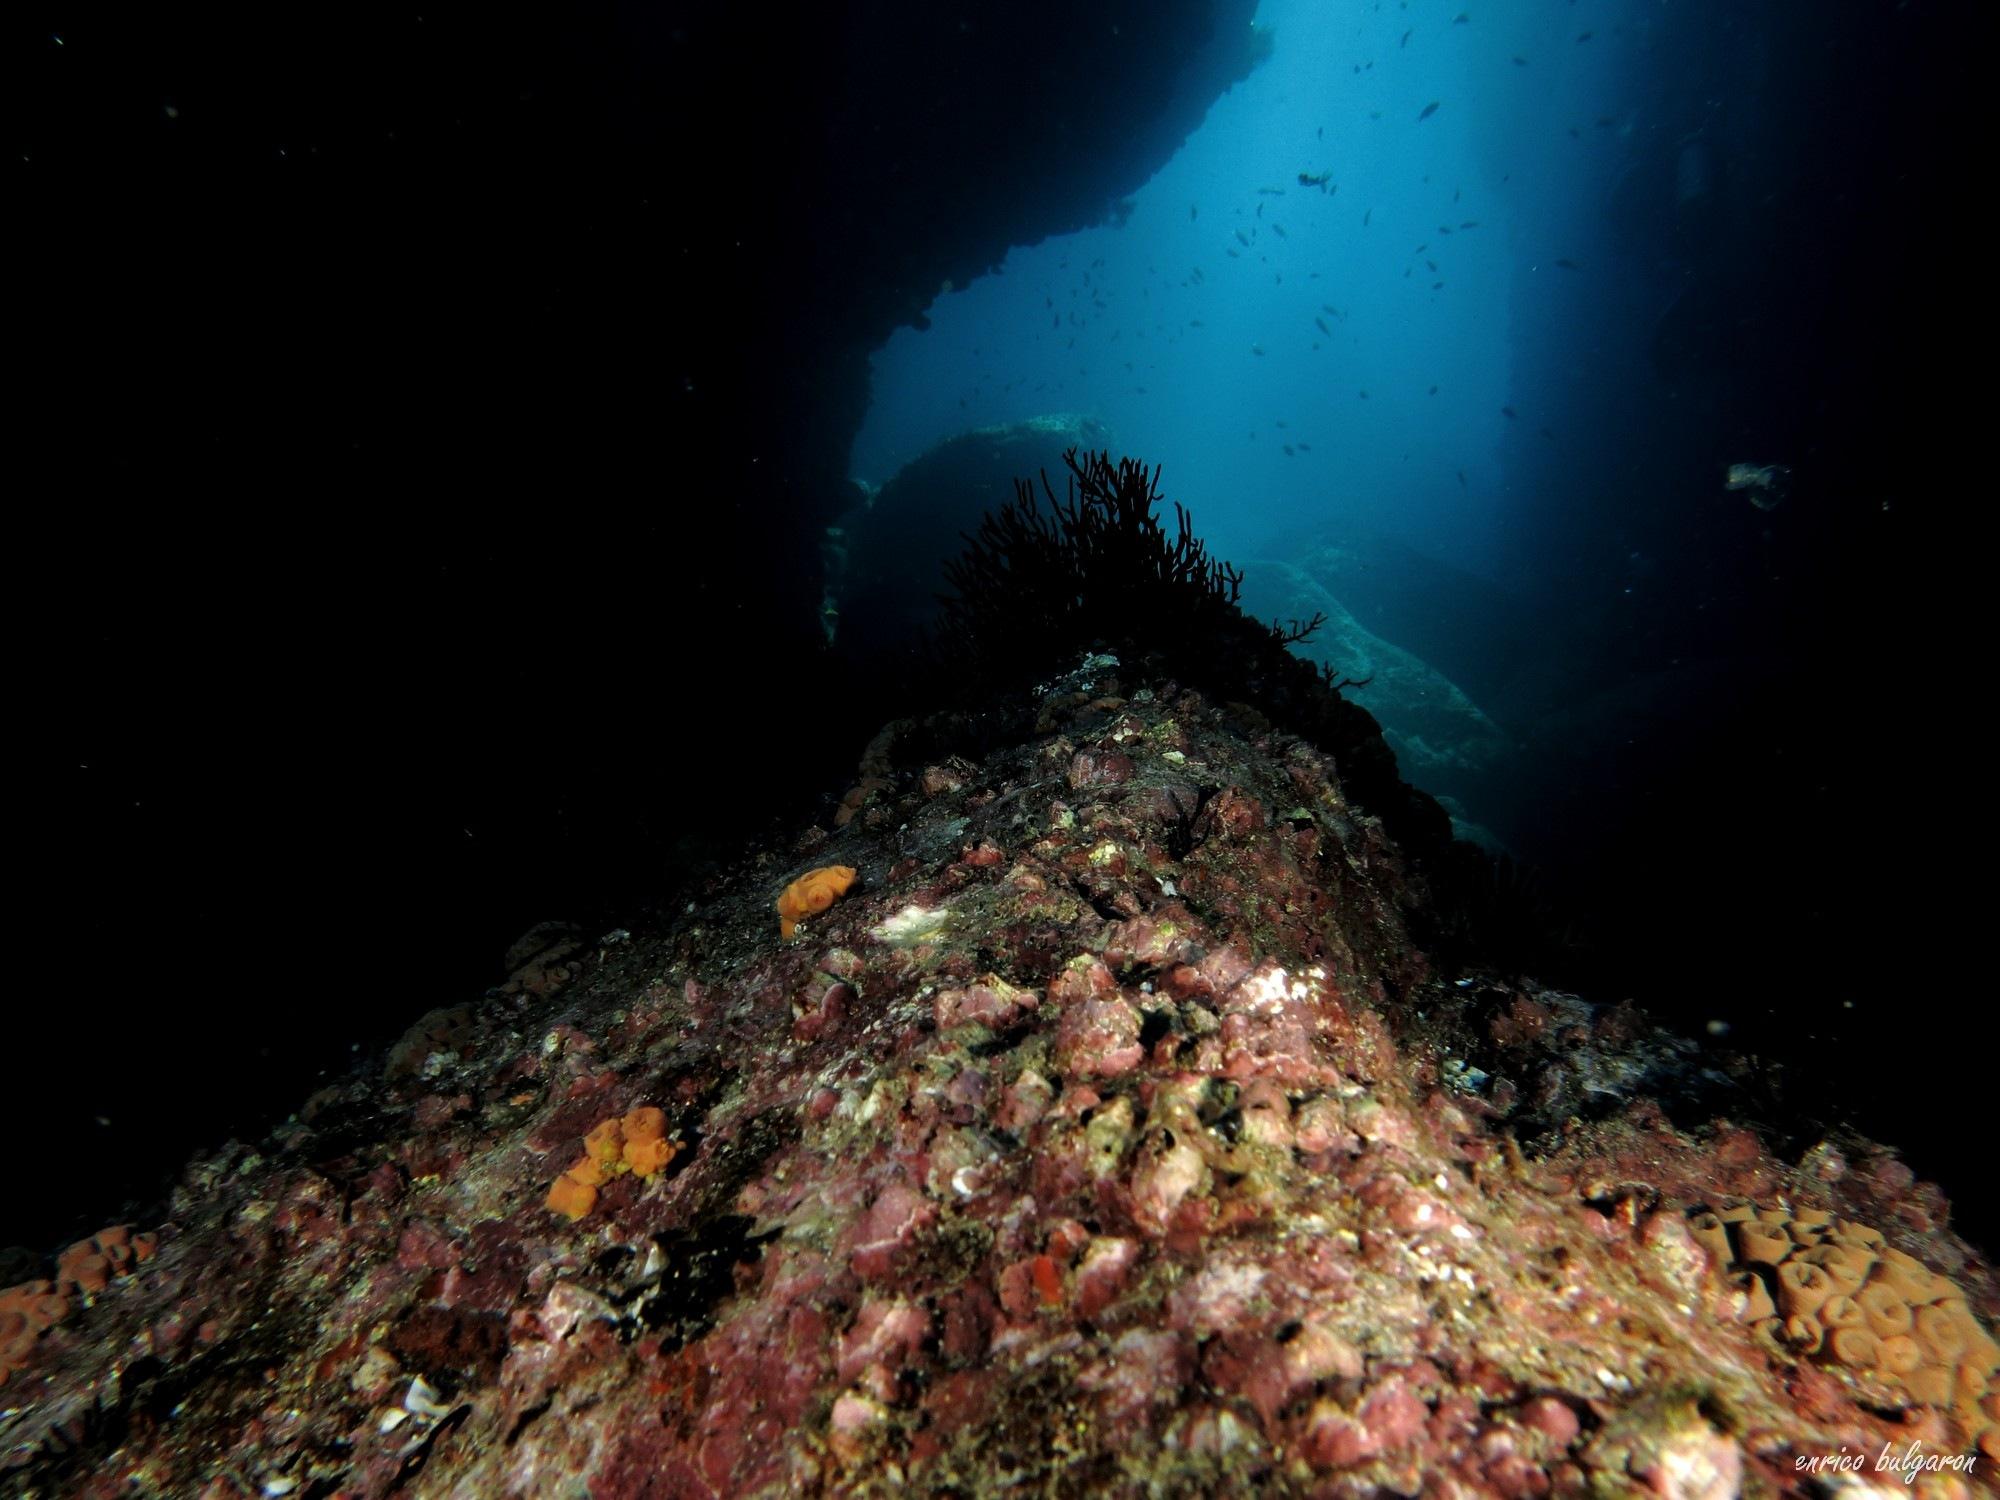 Underwater World by Enrico Bulgaron